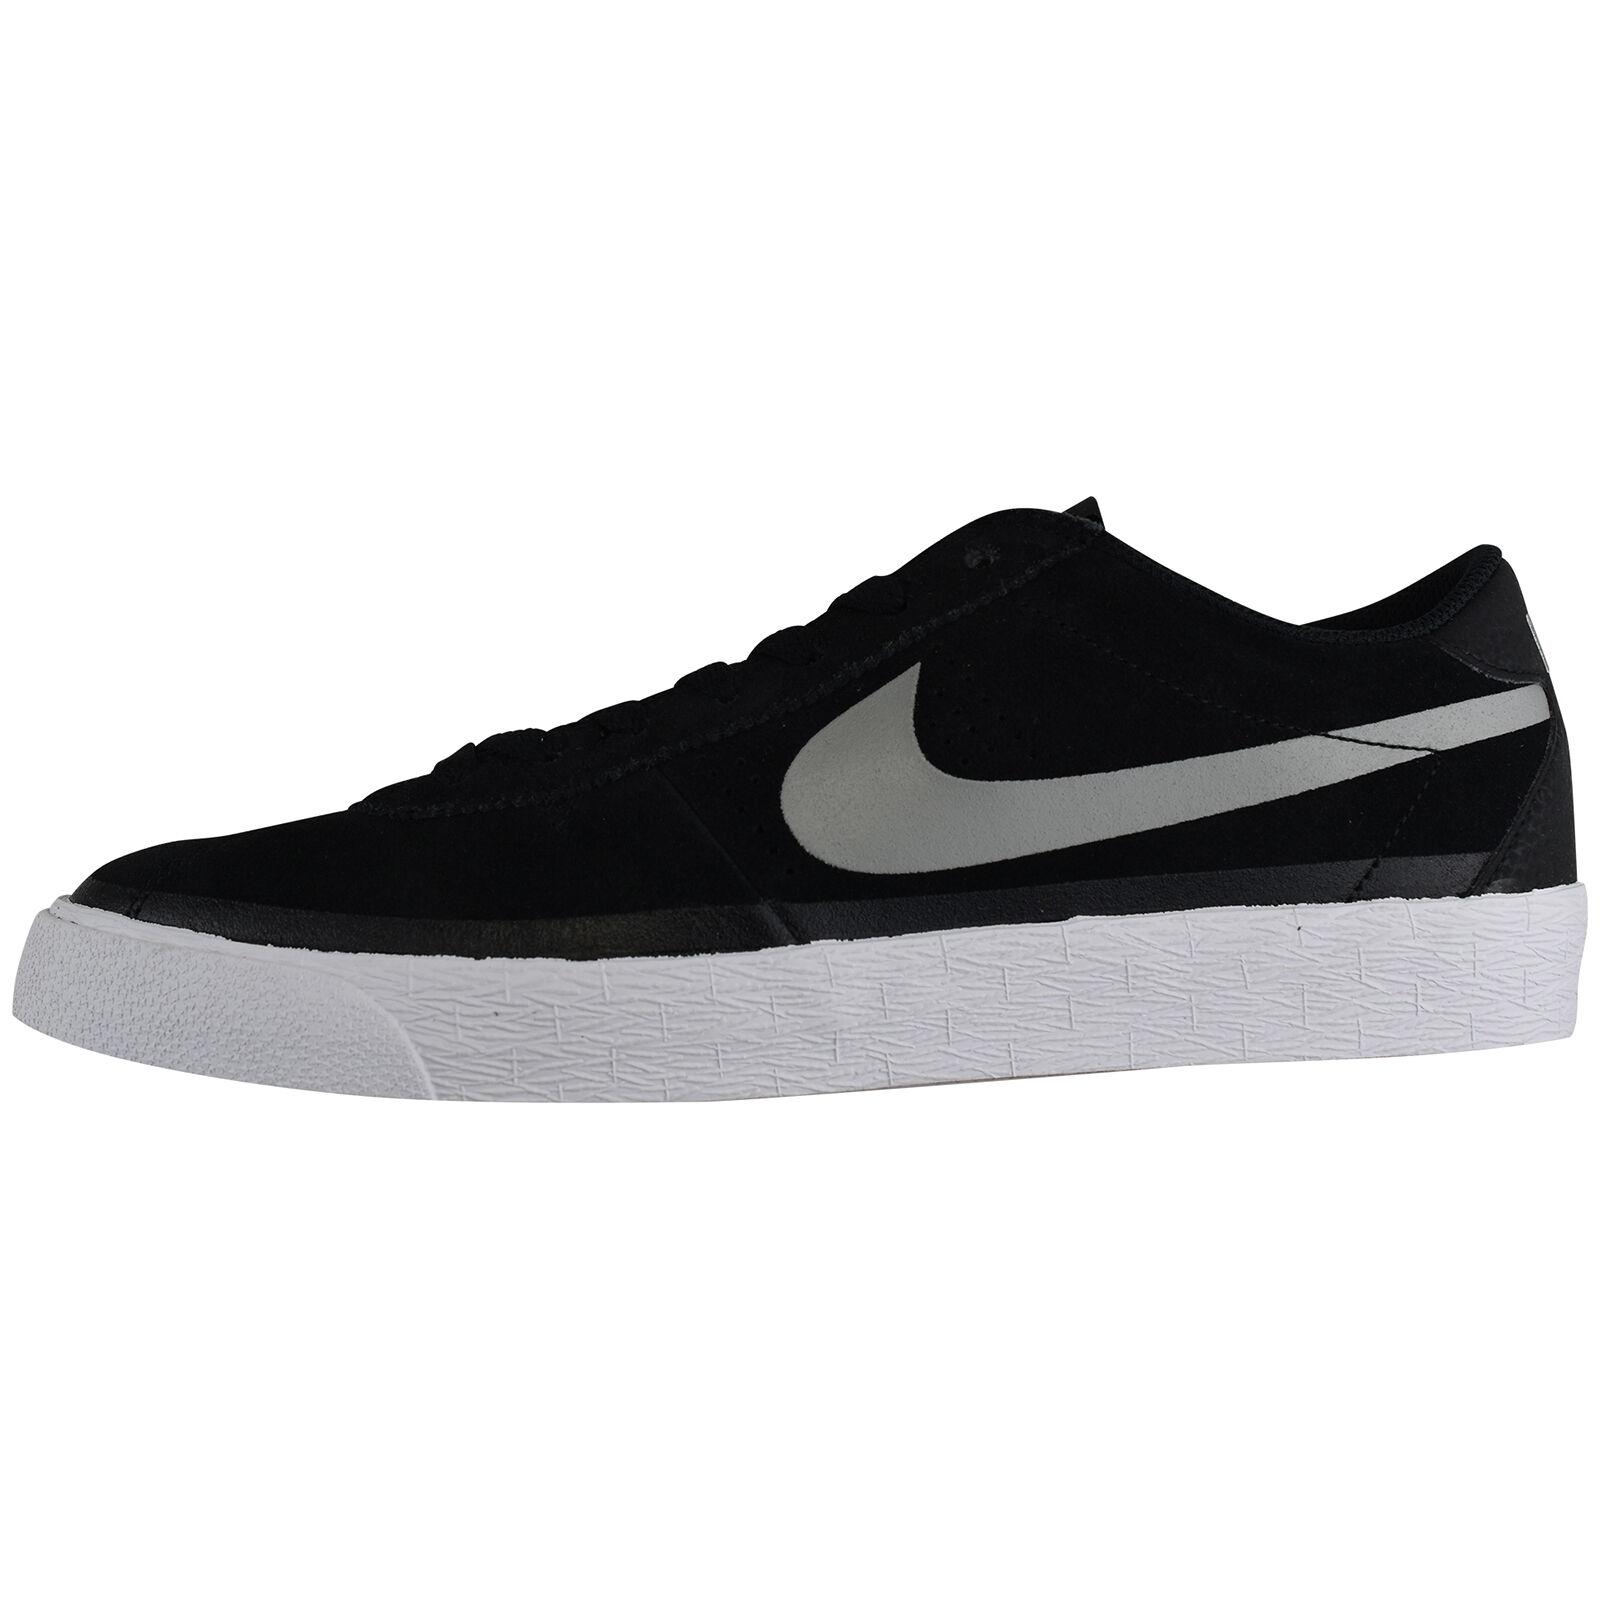 Nike Skateboard Bruin SB Premium SE 631041-001 Skaten Skateboard Nike Freizeit Schuhe Sneaker 42cb28